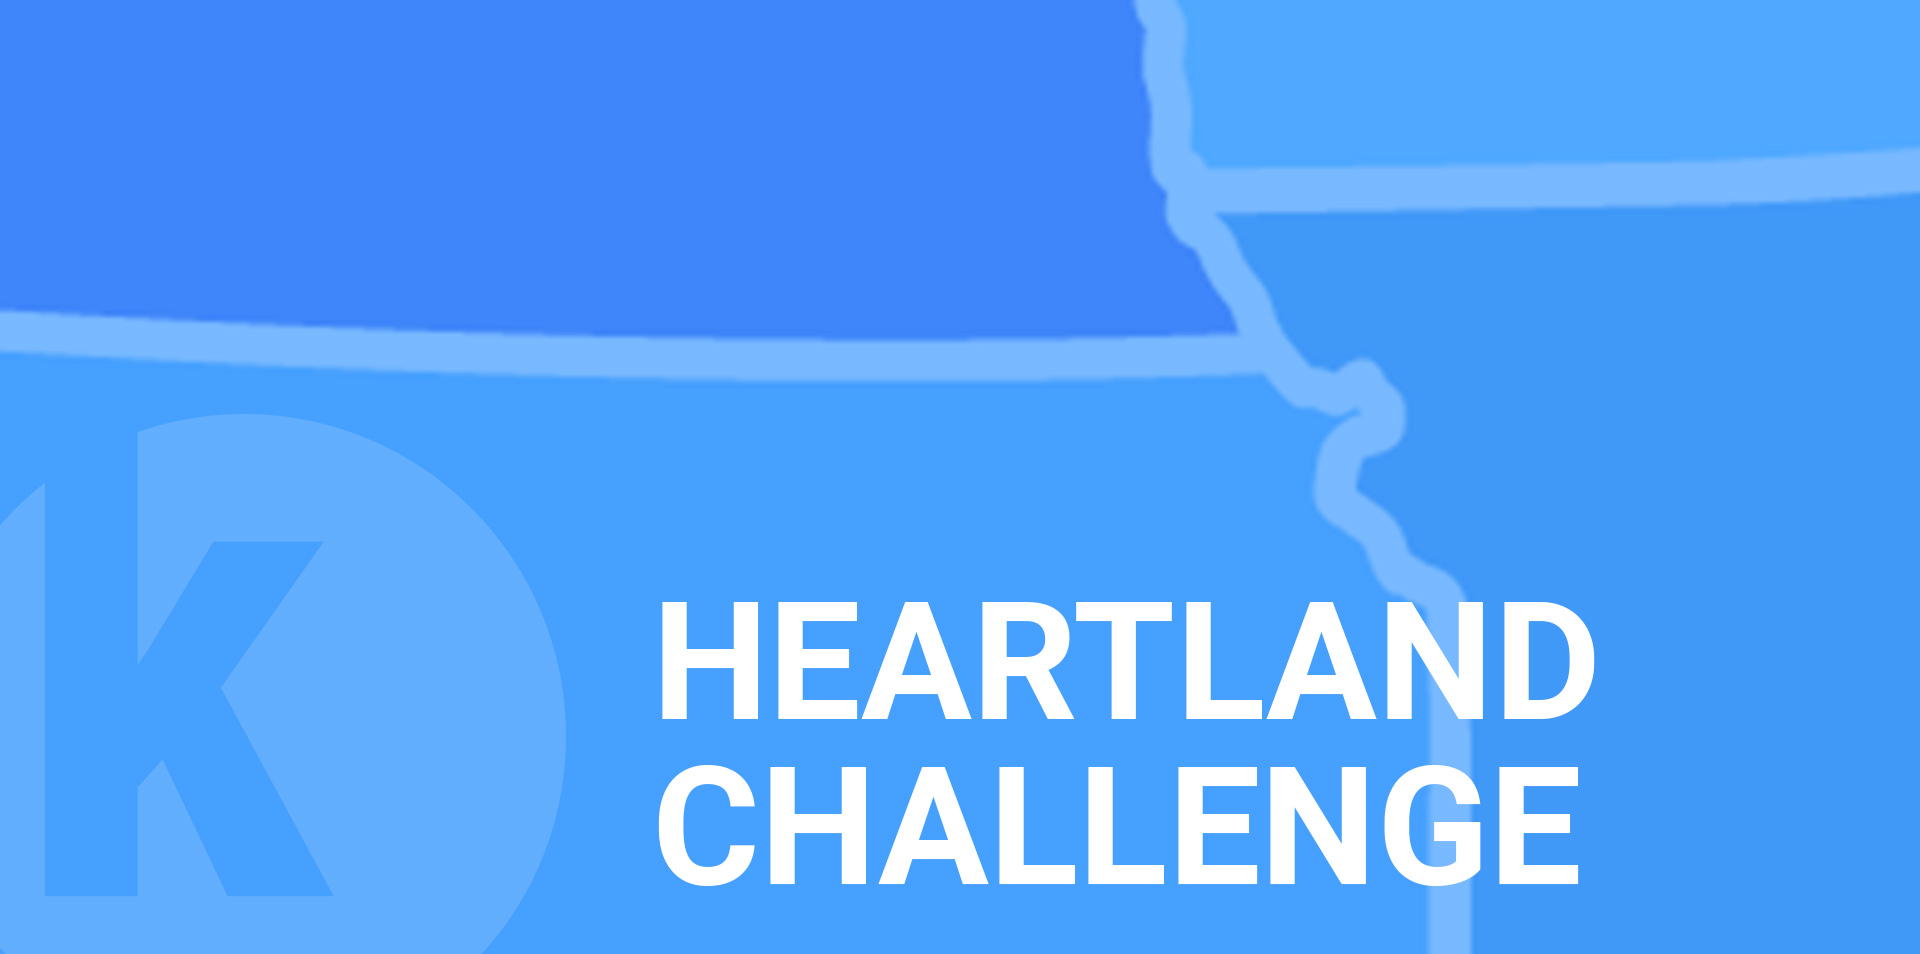 2020 Heartland Challenge RFP for Missouri, Iowa, Nebraska, and Kansas